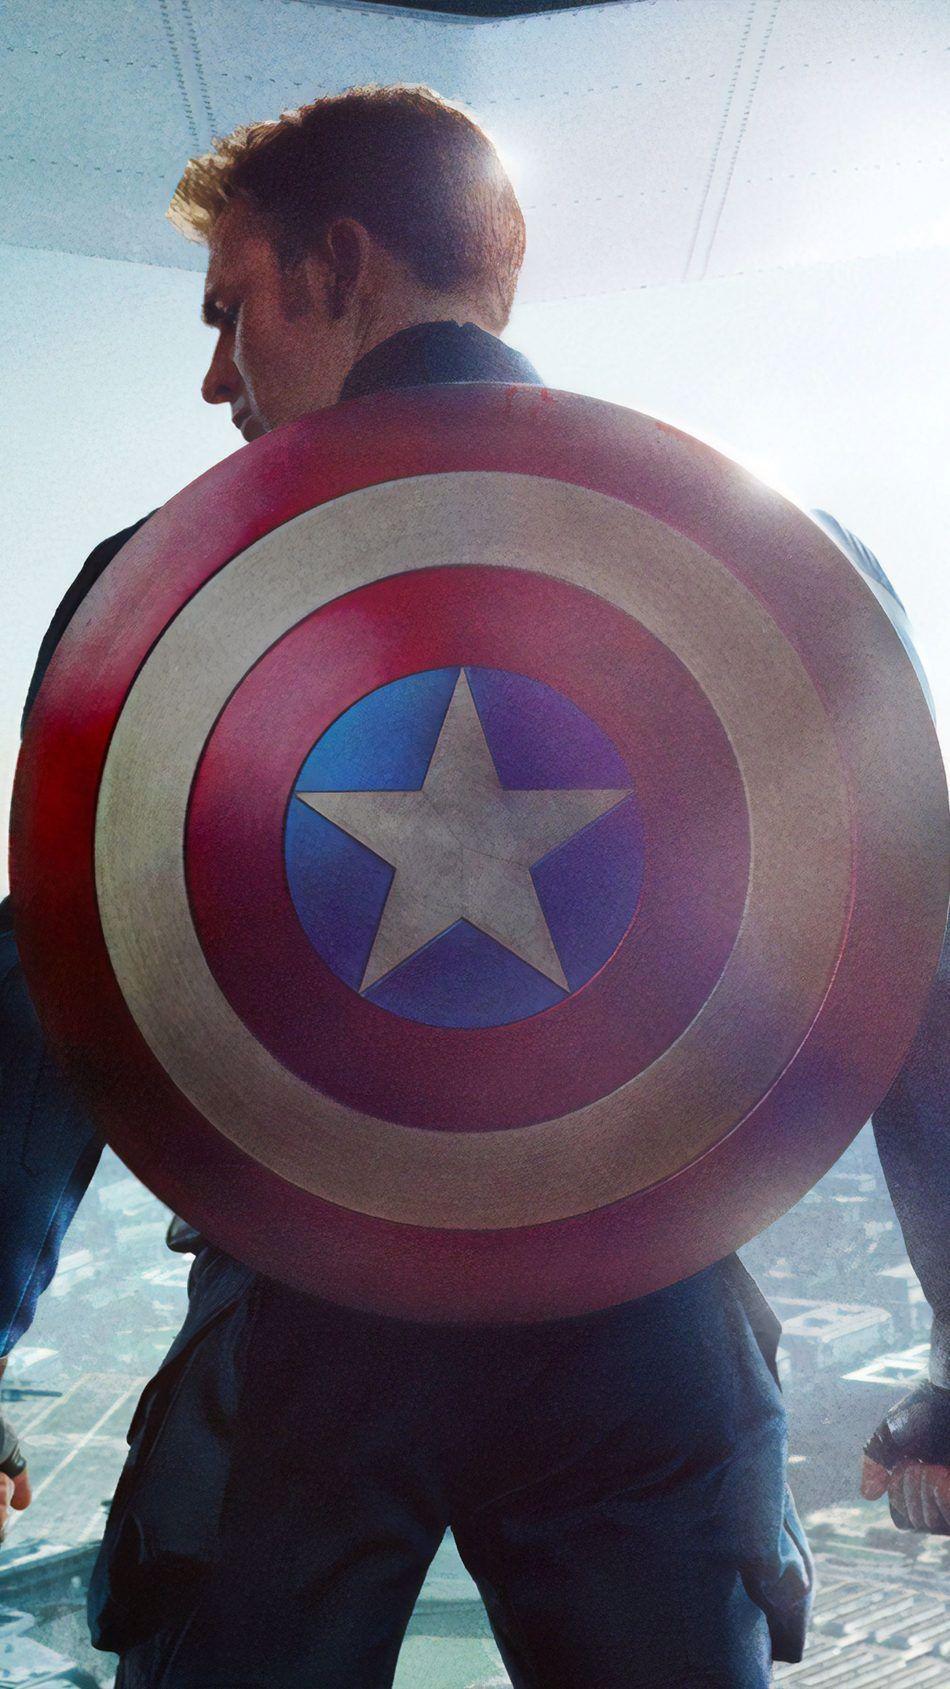 Chris Evans Captain America Shield 4k Ultra Hd Mobile Wallpaper In 2020 Captain America Drawing Captain America Art Captain America Poster